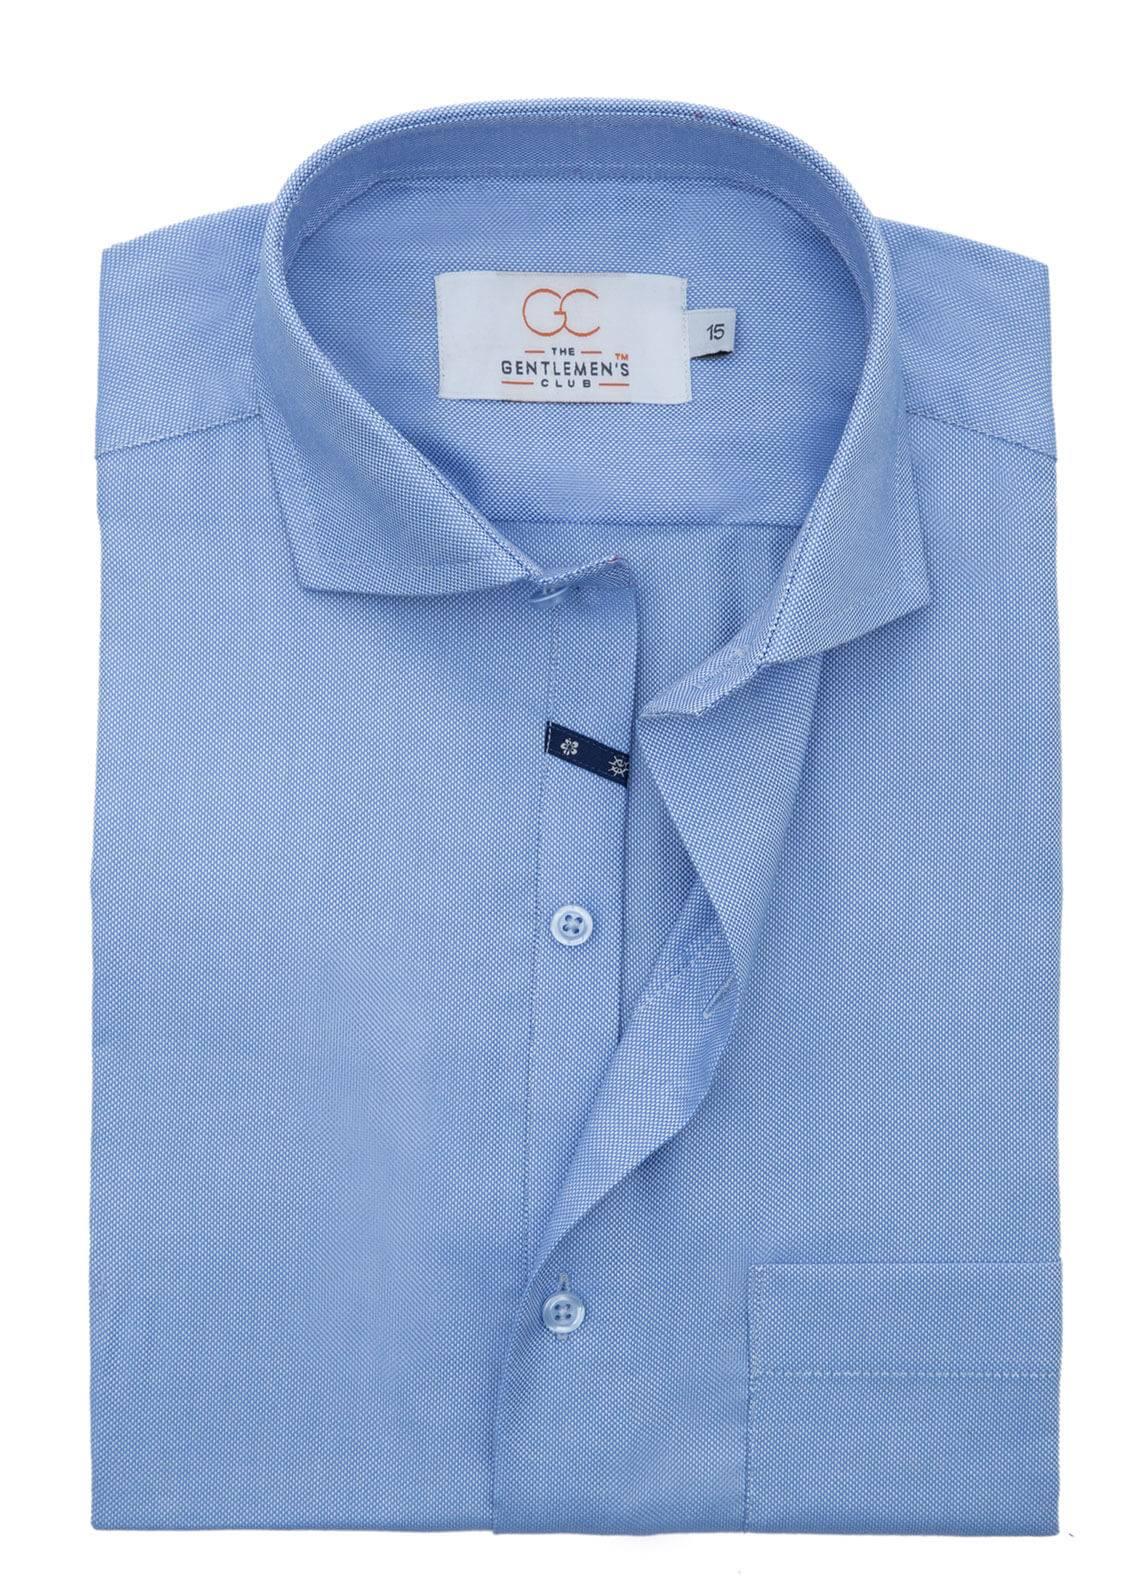 The Gentlemen's Club Cotton Formal Shirts for Men - Blue White Label 4066 - 18